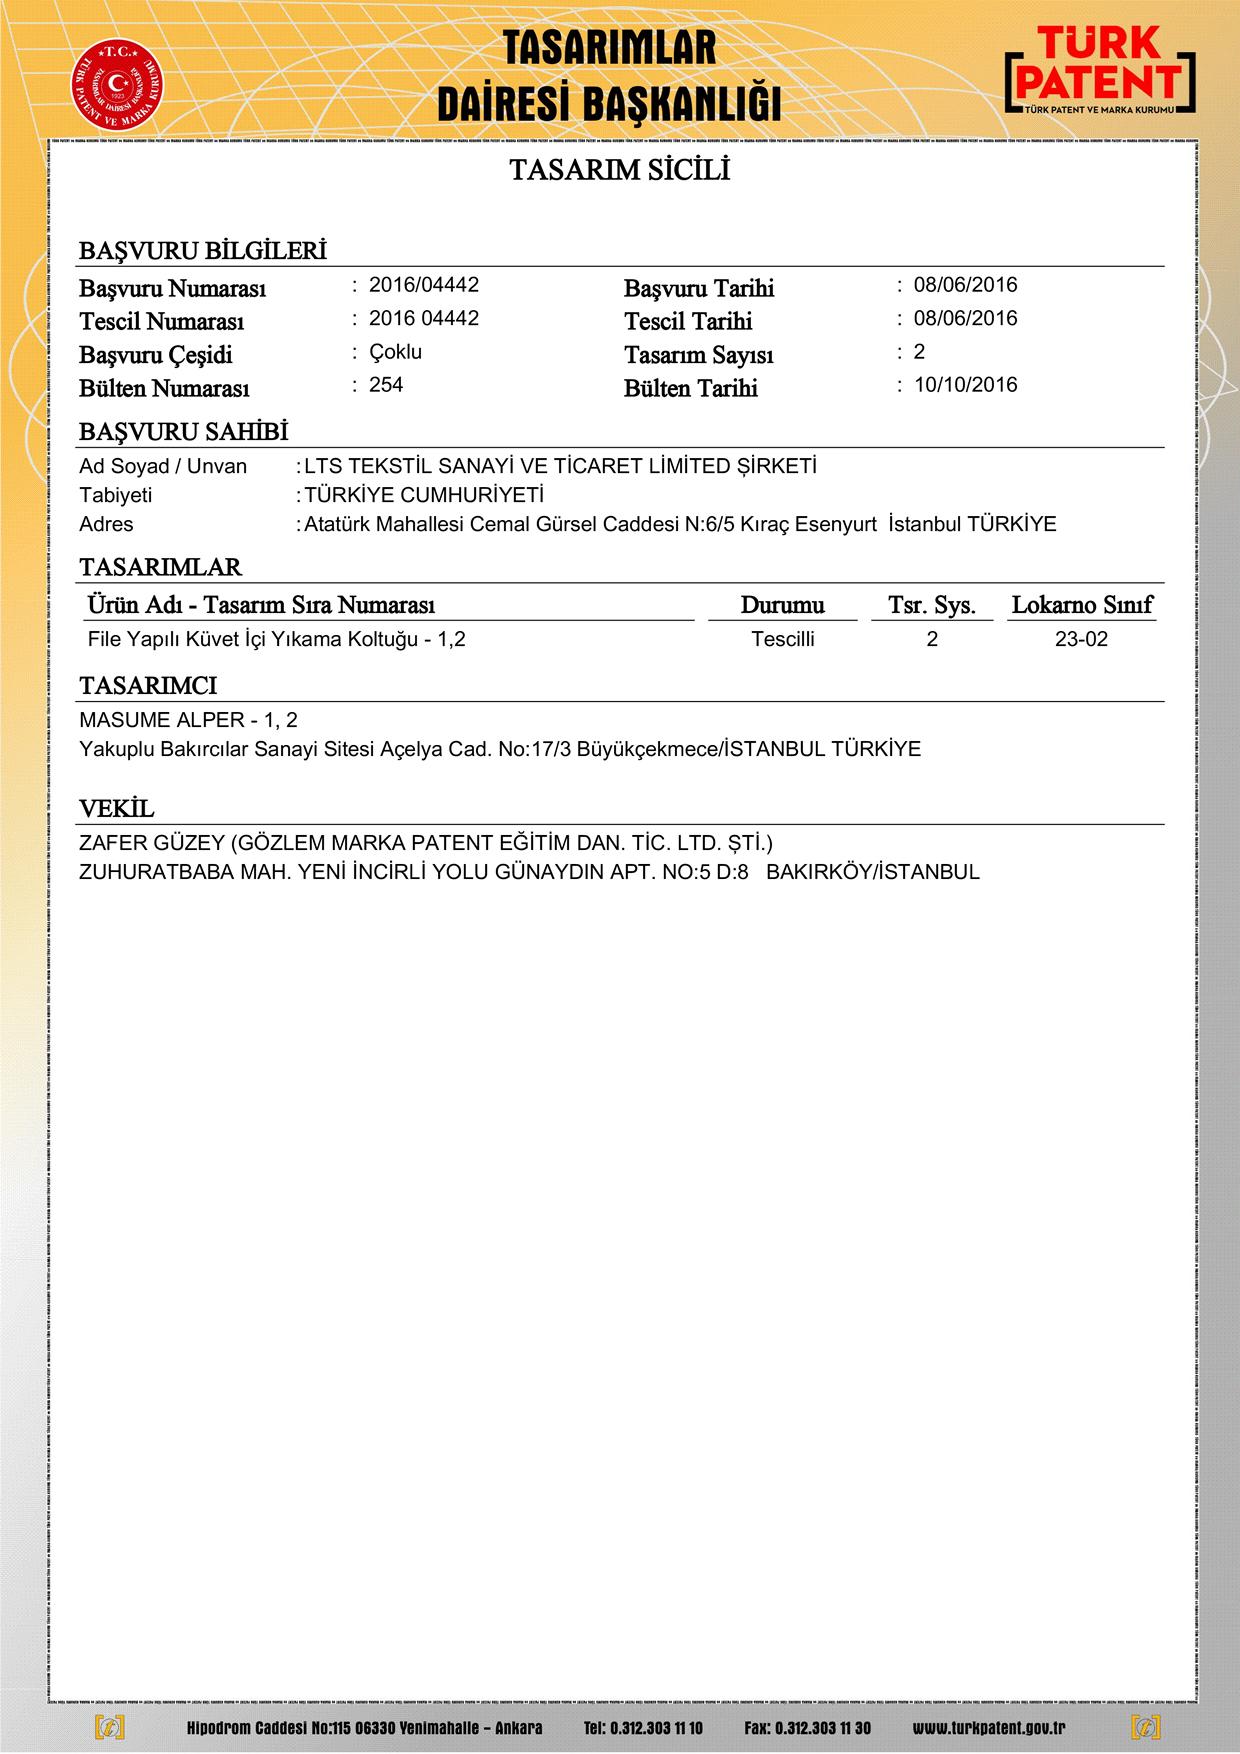 Bebek Yıkama Filesi Patent 3